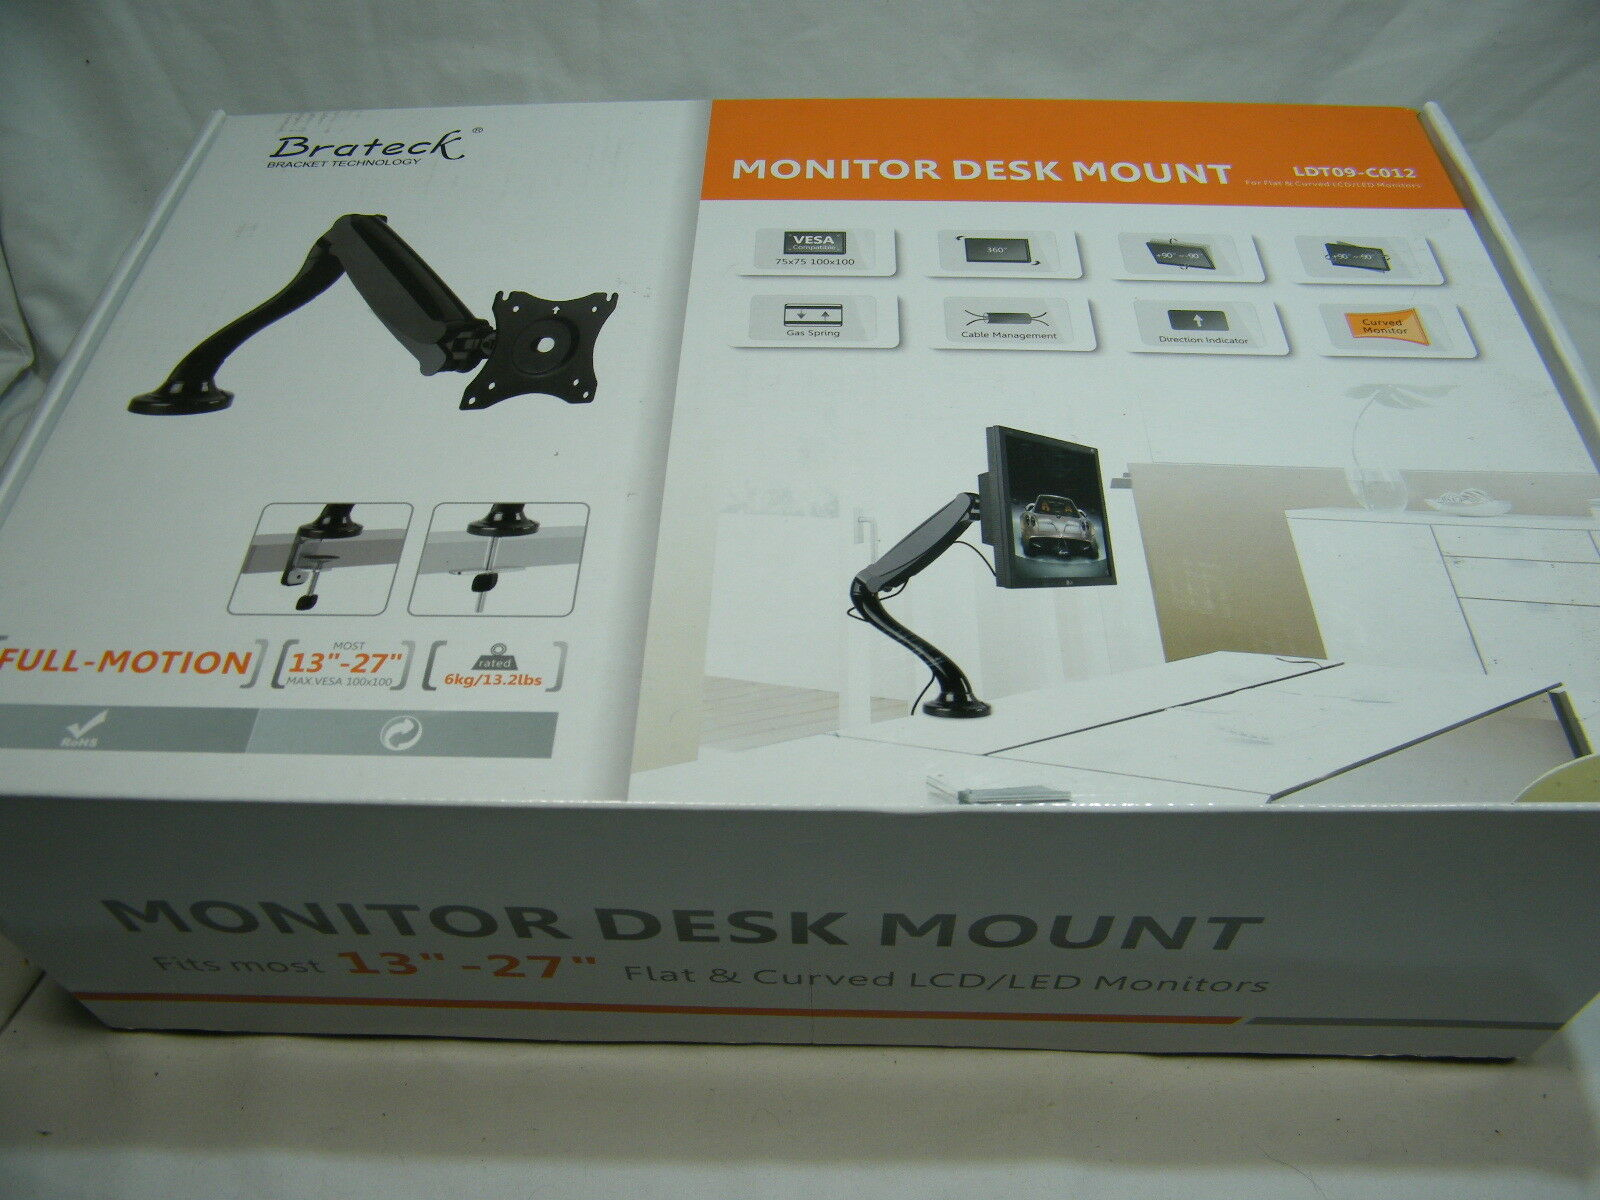 Brateck LTD09C012 Single Full-Motion Balanced VESA Desk Moun